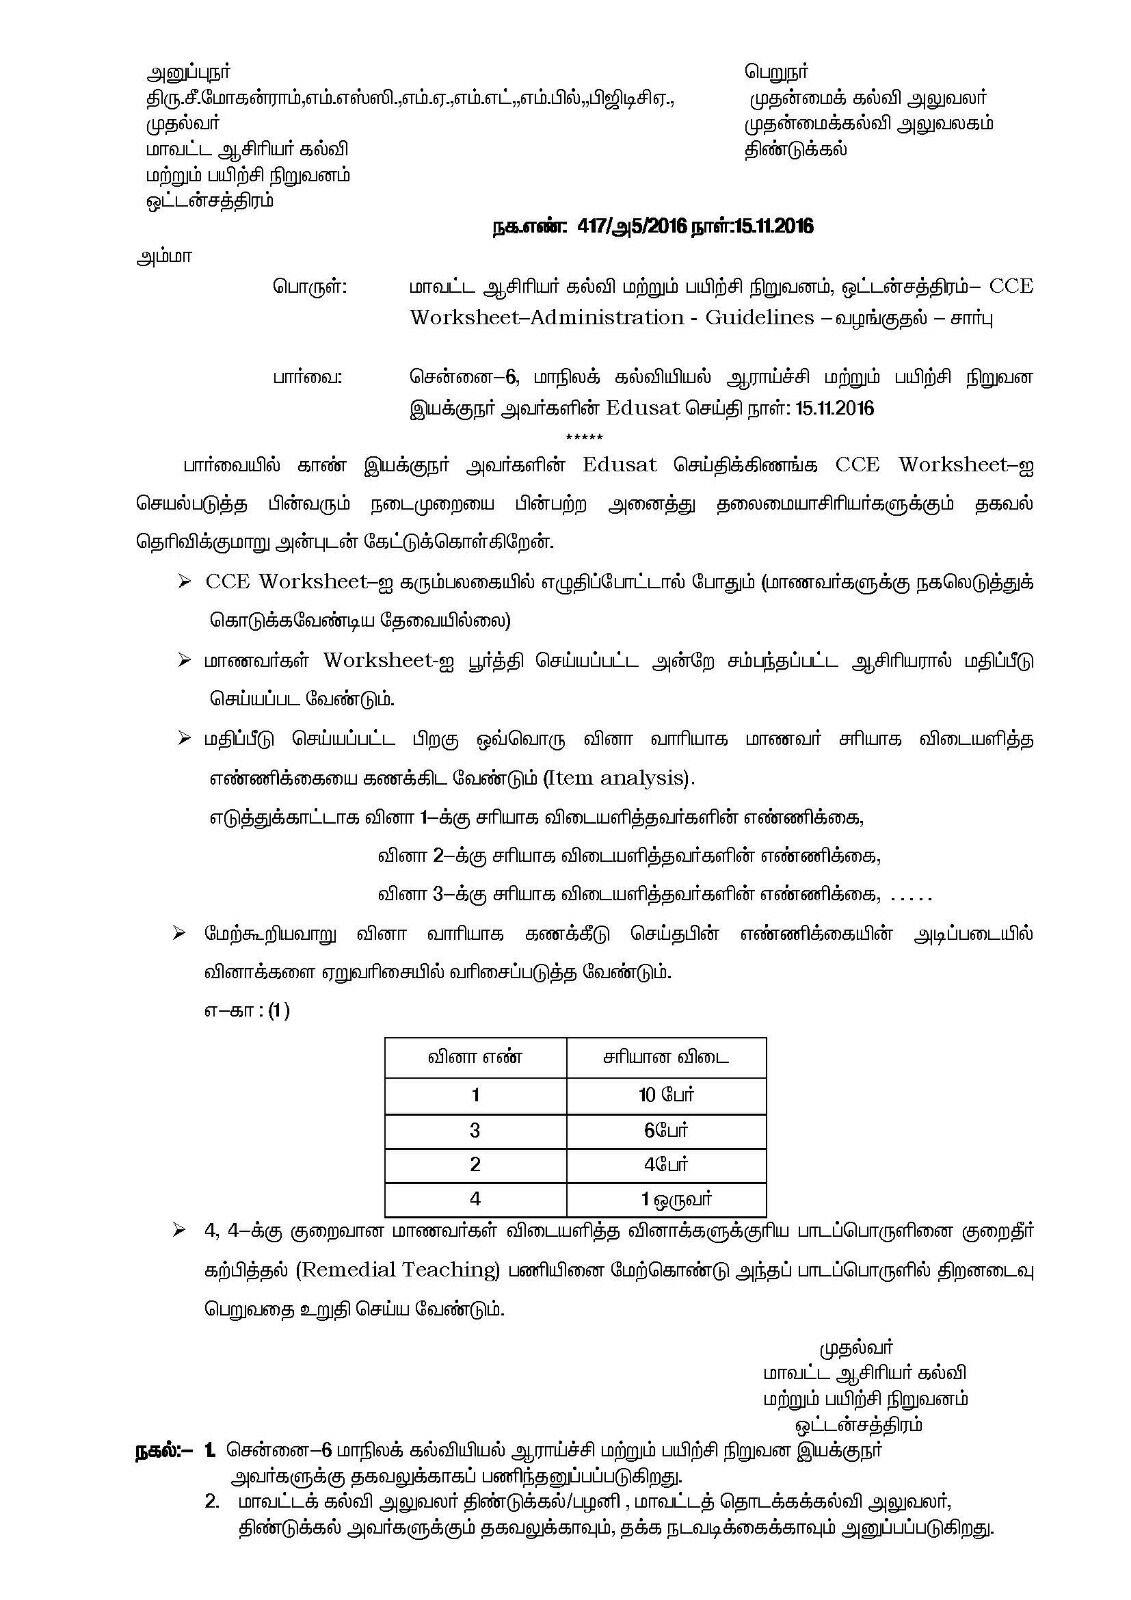 Gurukulam Cce Worksheet Exam Guidelines Proceeding